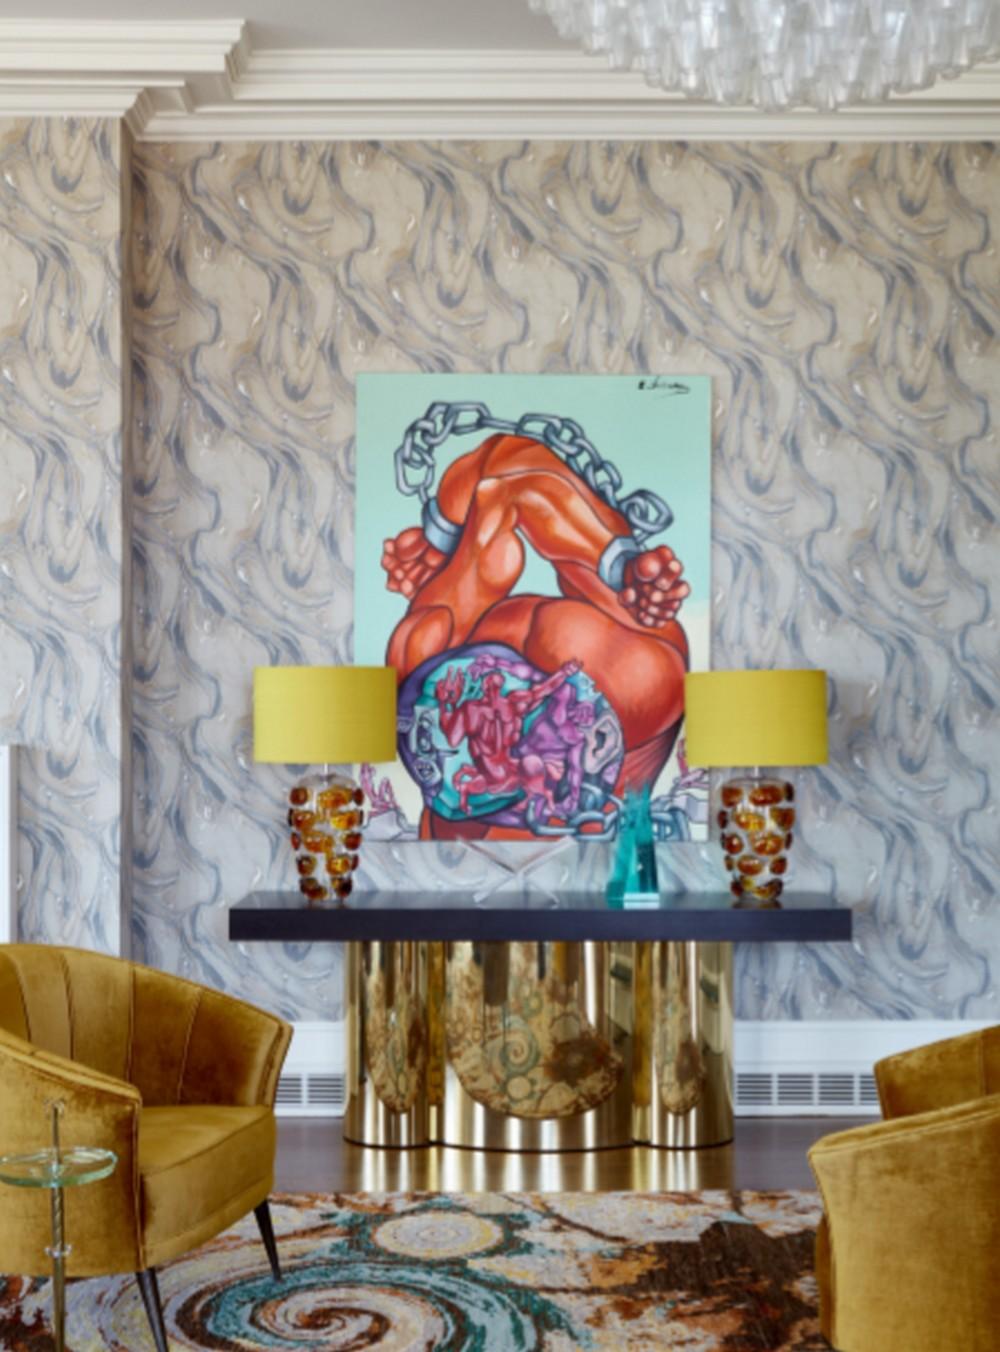 A look into some brand new interior design projects – Part 2 interior design projects A look into some brand new interior design projects – Part 2 Annaiev2